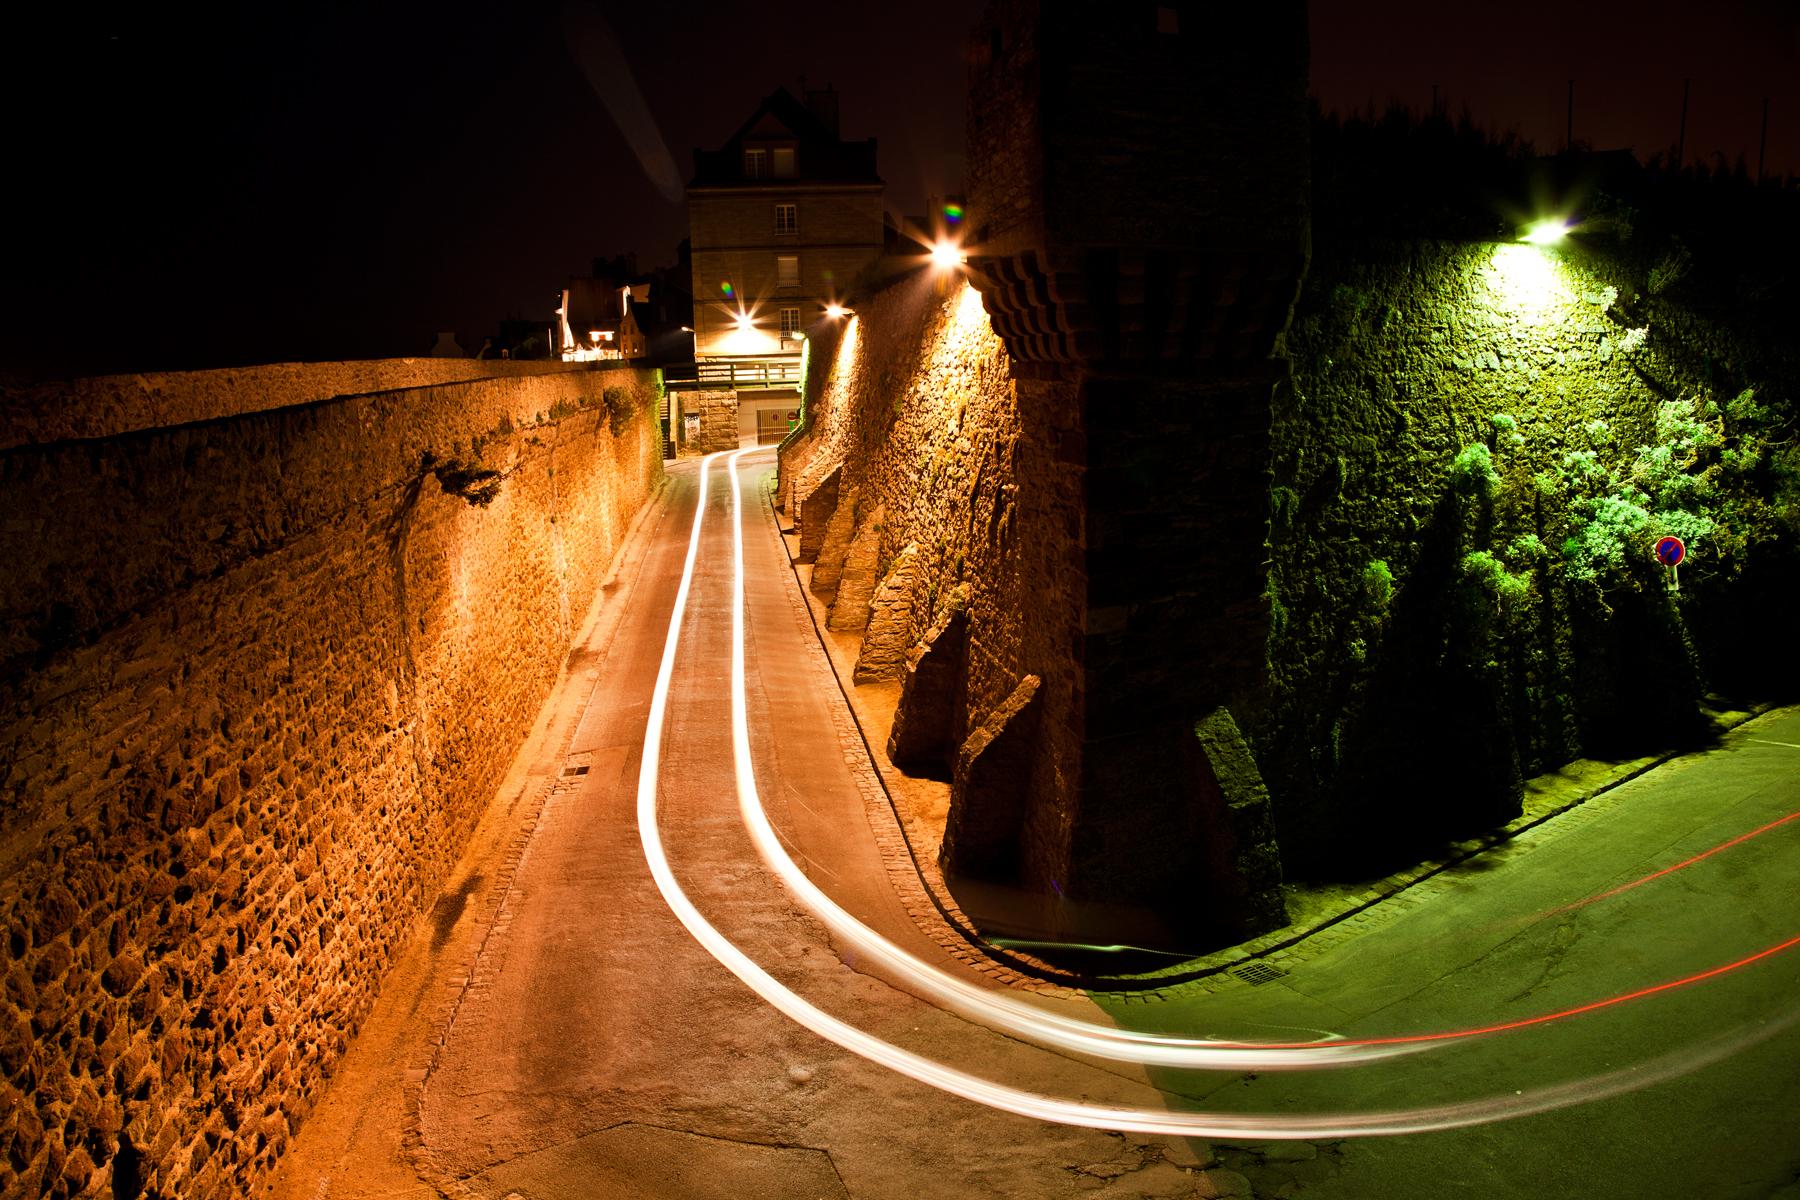 Saint-Malo Street Scene, Ancient, Red, Split, Somadjinn, HQ Photo